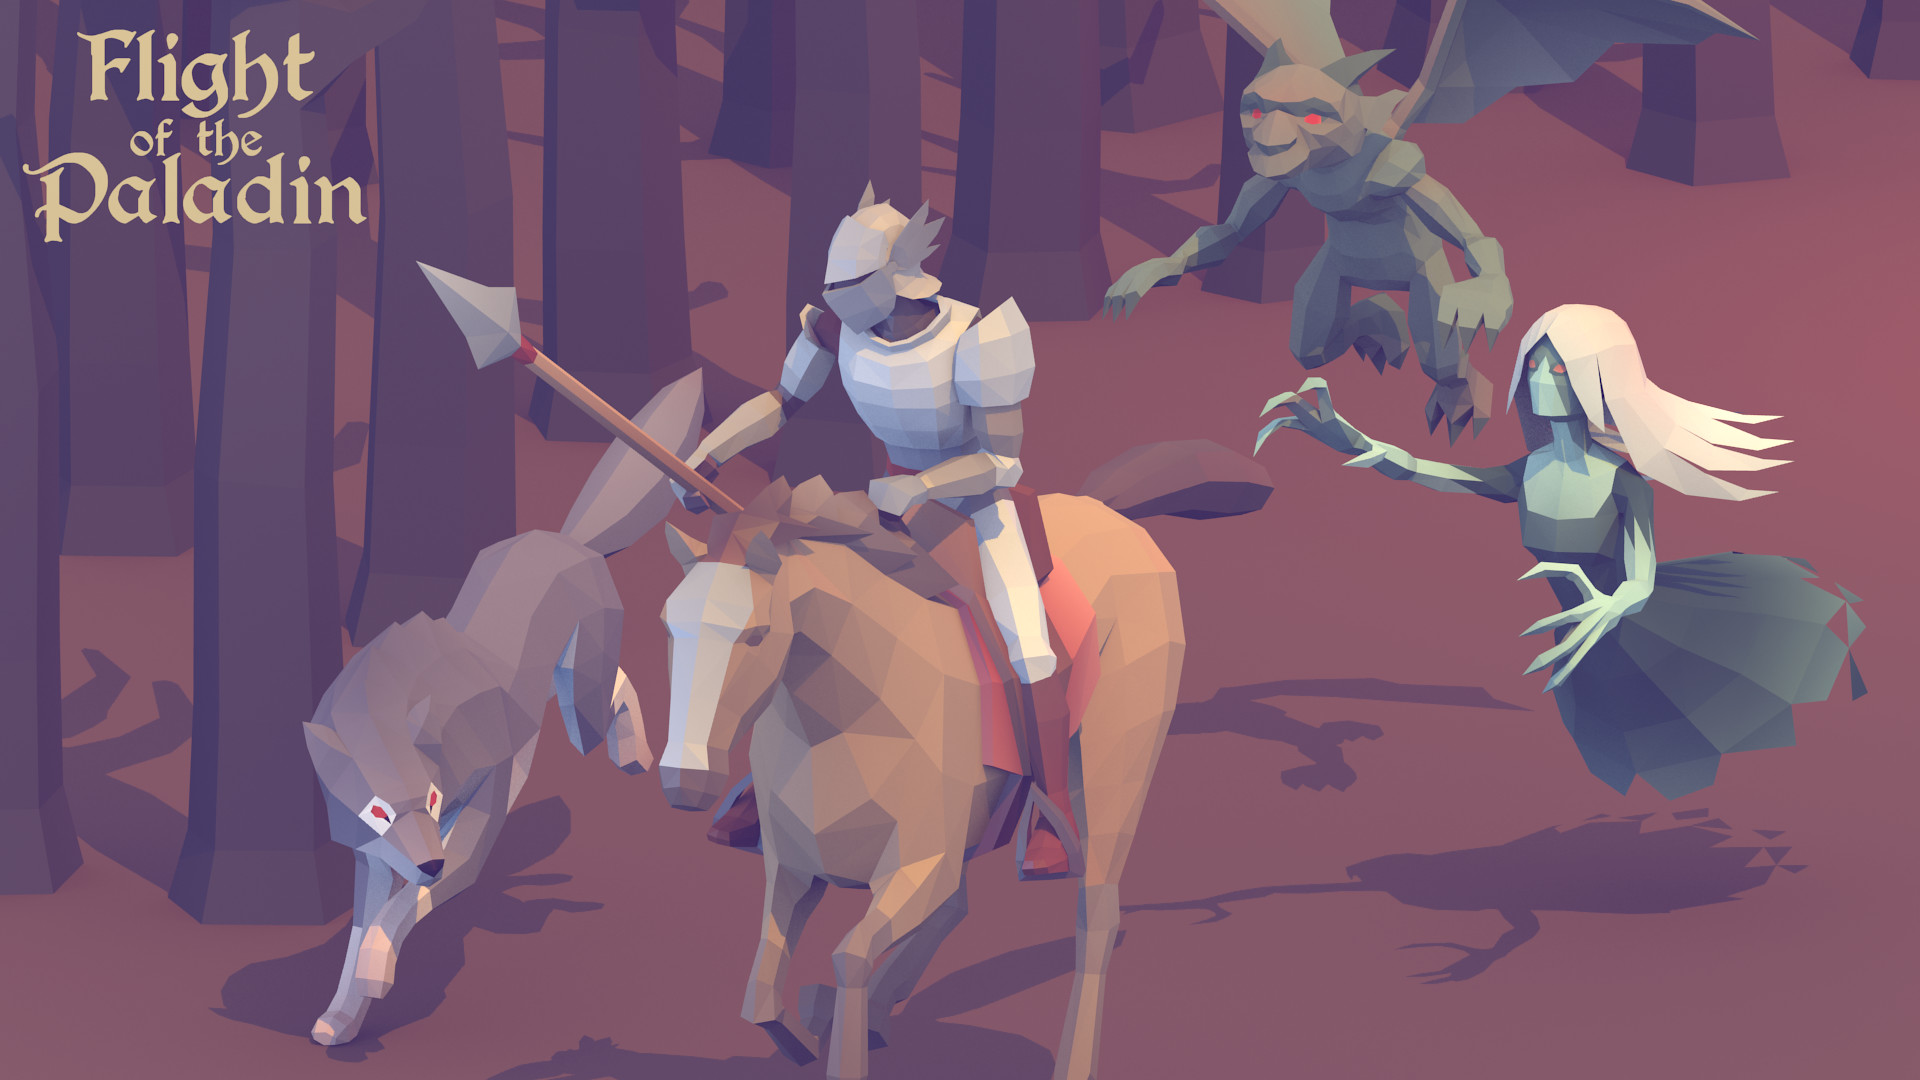 Flight of the Paladin screenshot